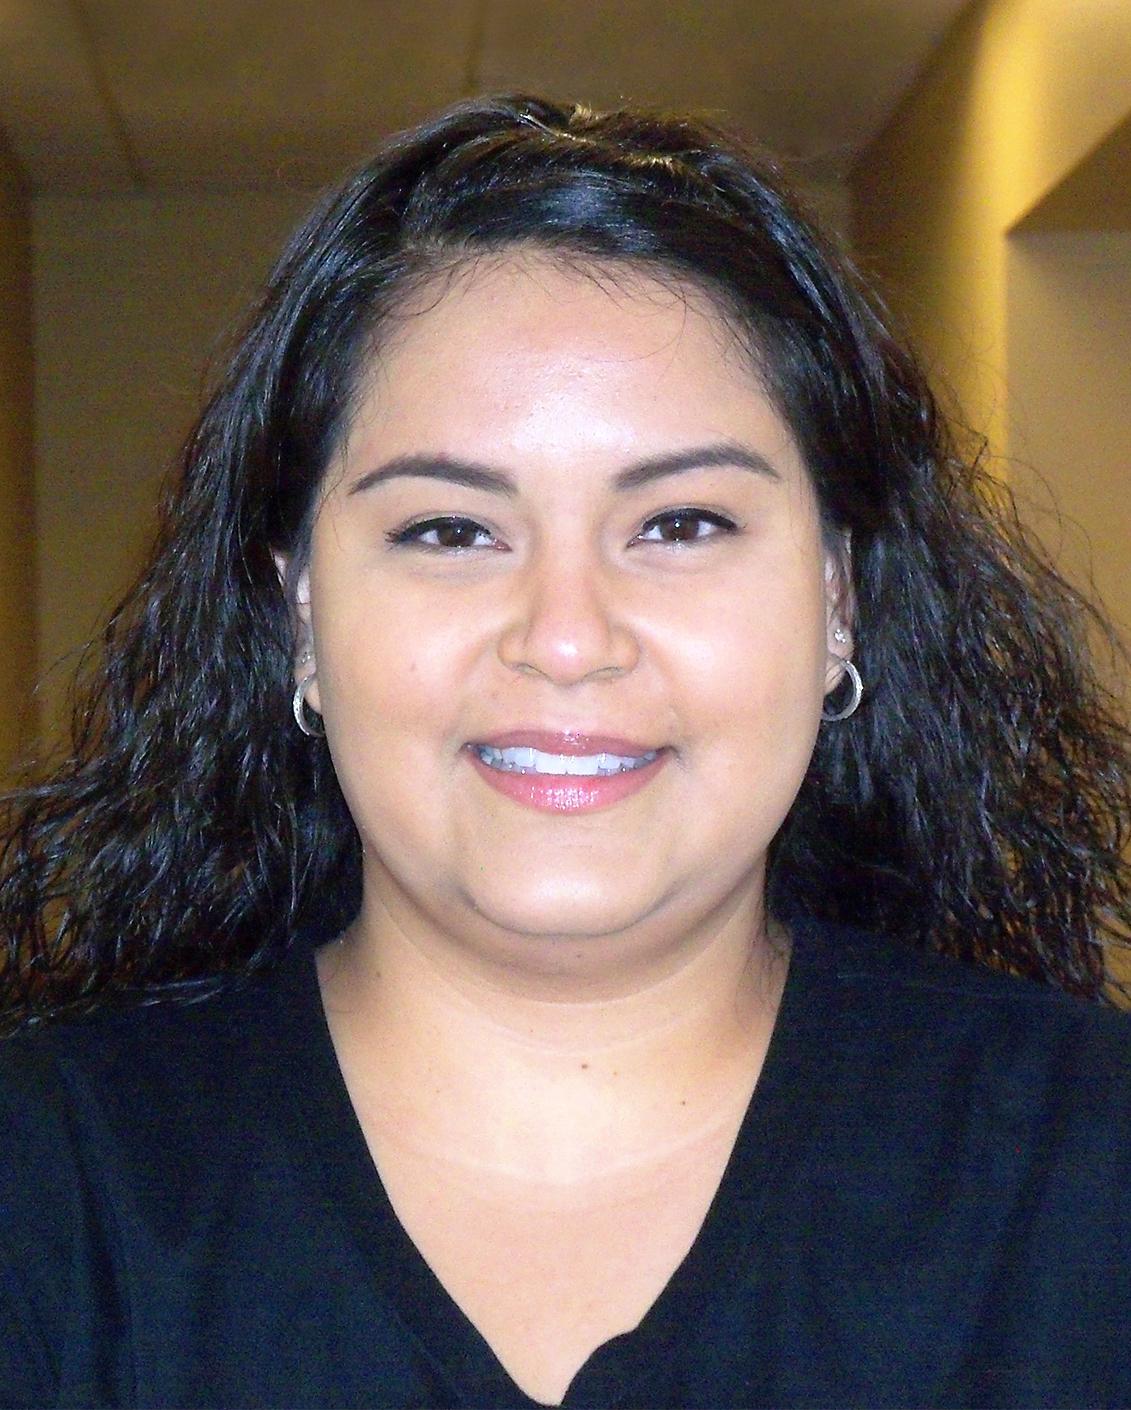 Central WA Family Medicine Adds New Clinic Nurse Supervisor